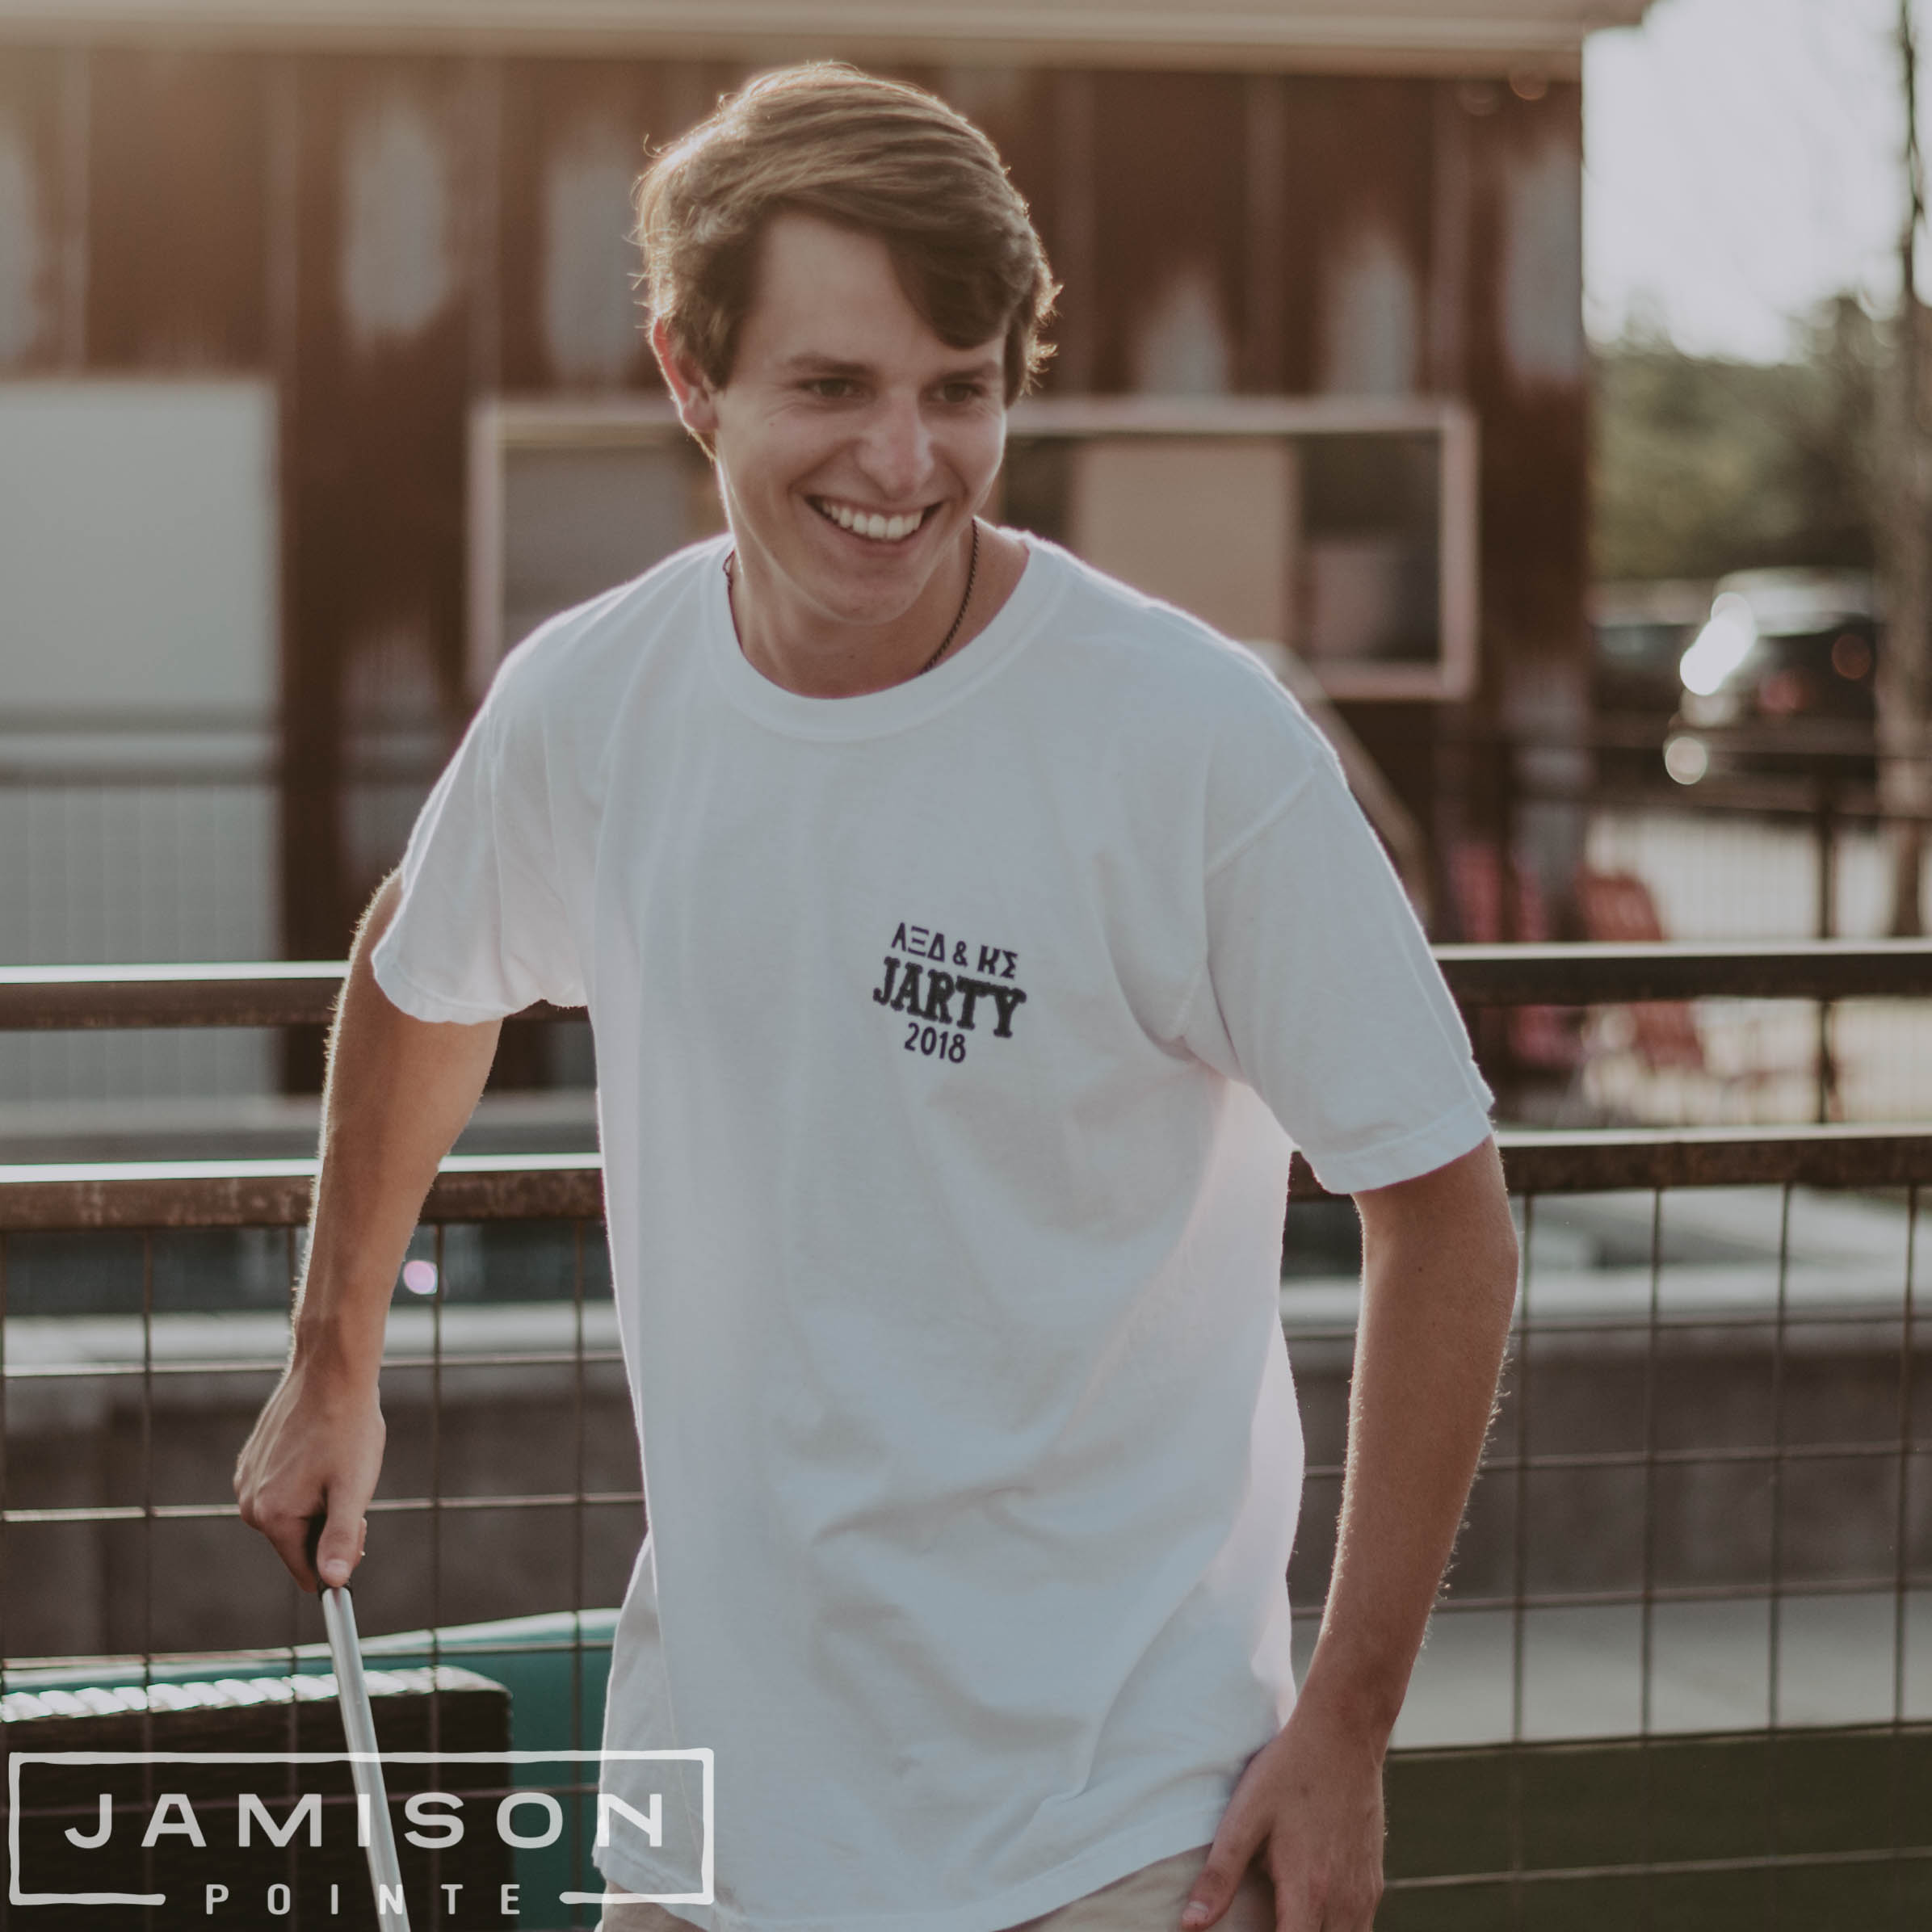 Kappa Sigma Jarty Tshirt